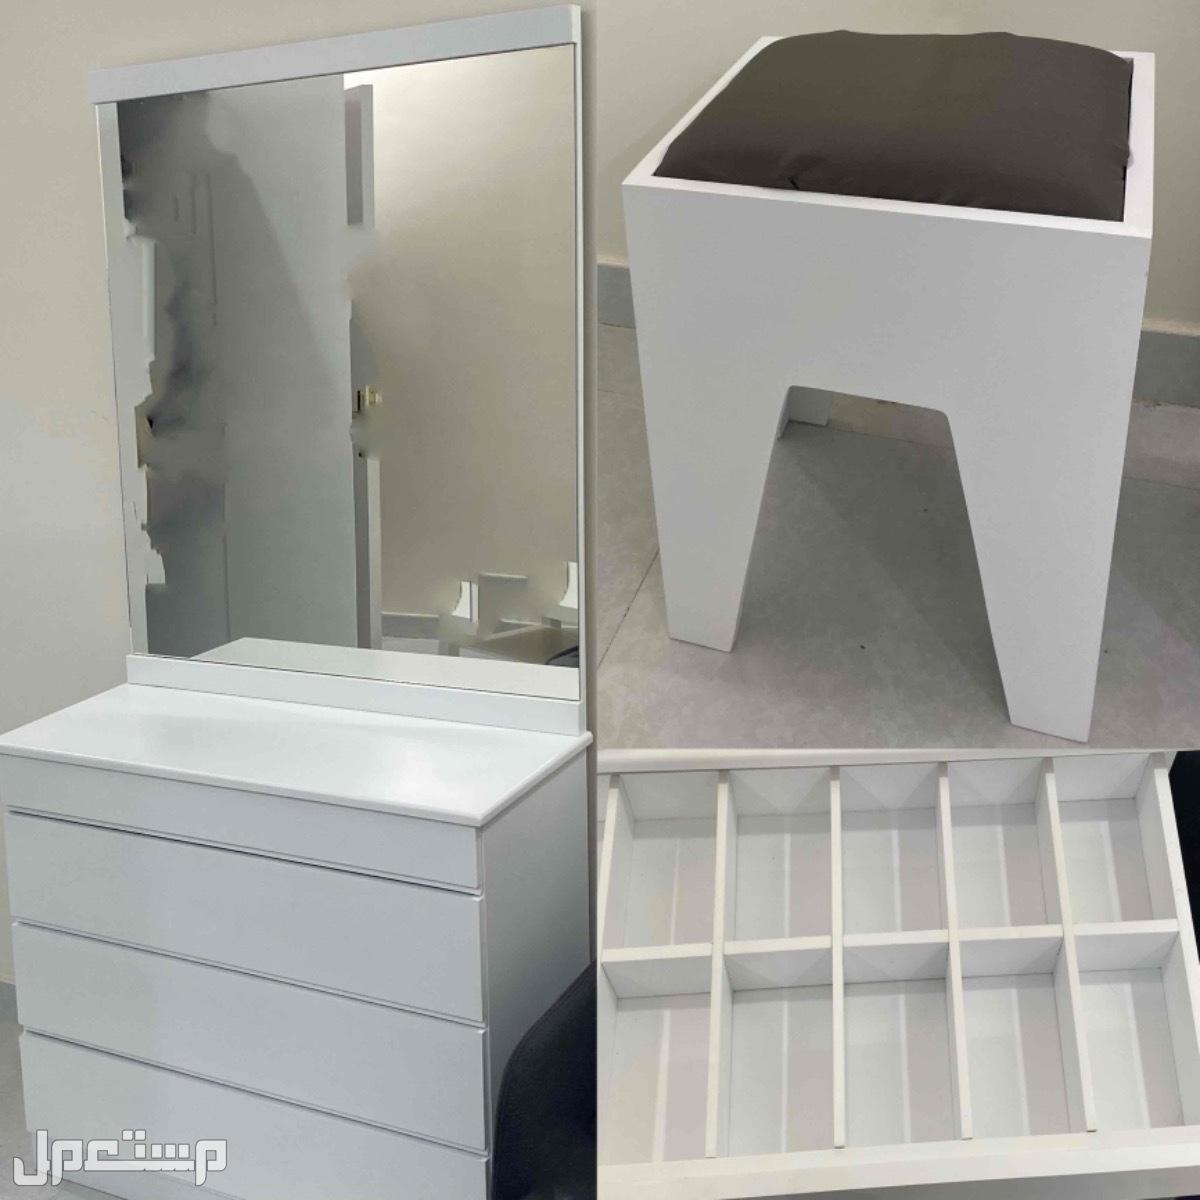 طقم غرفه نوم شبه جديده - مستعمله (شهر ونص)